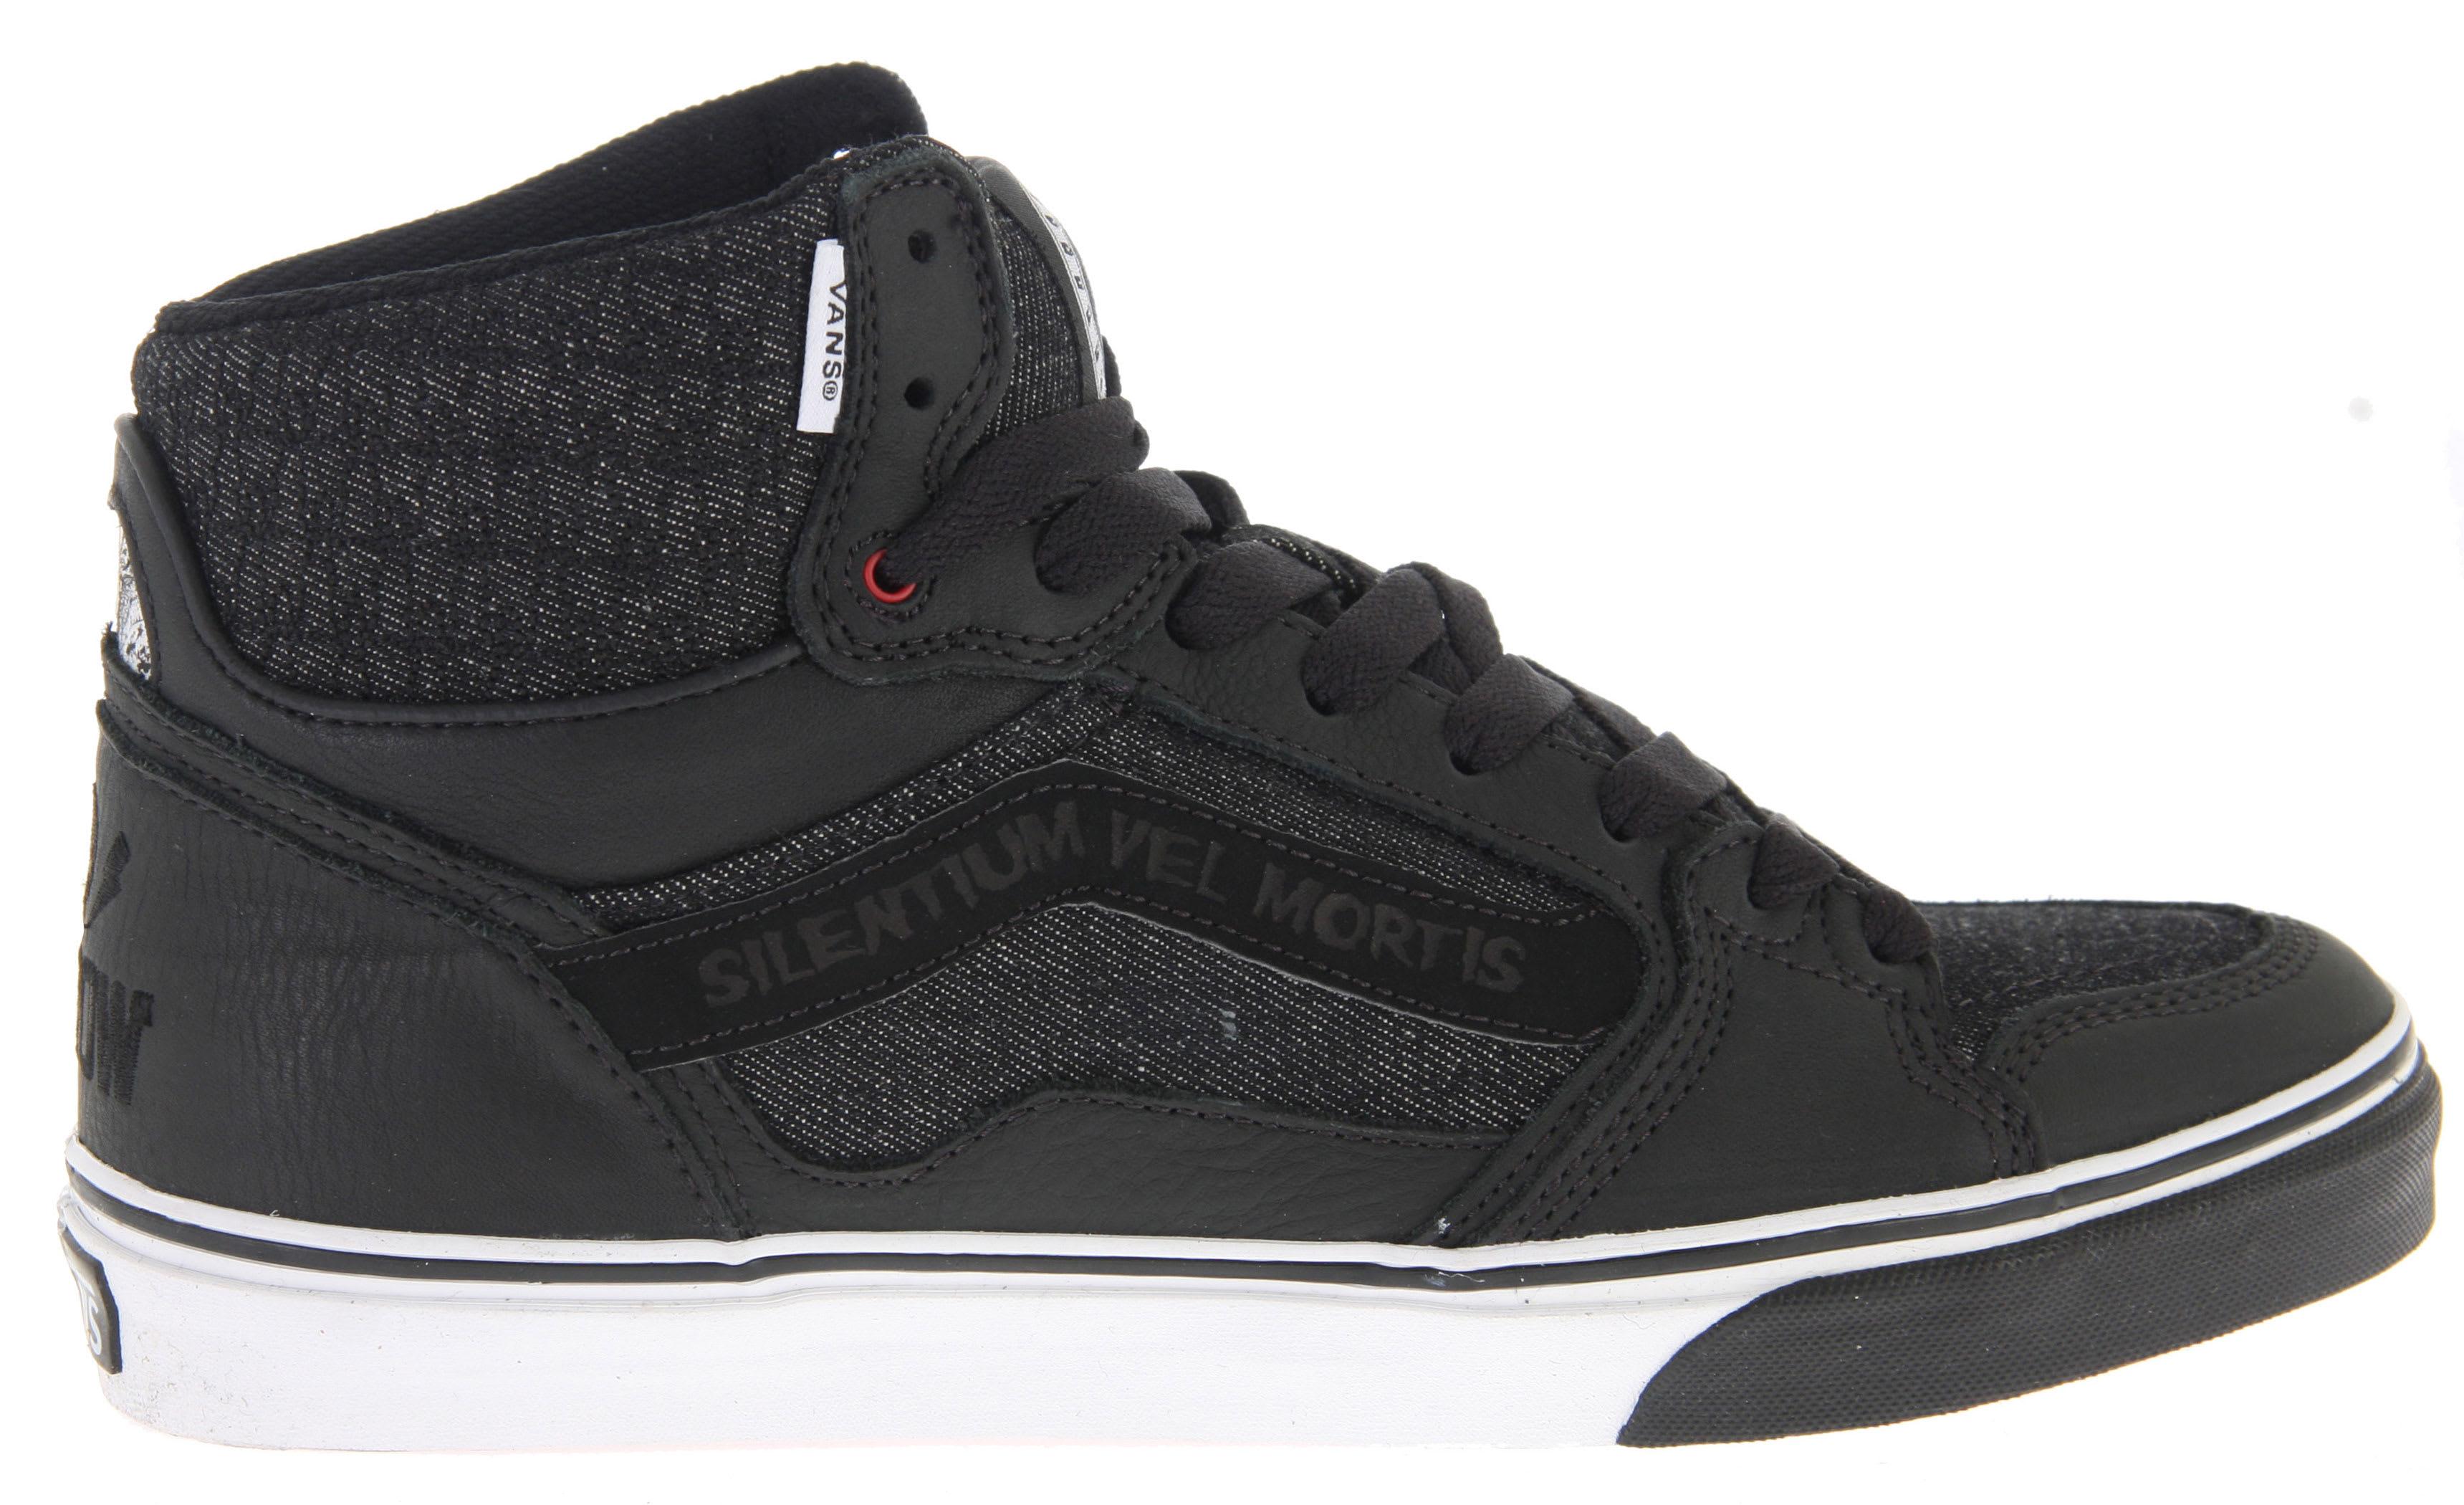 e1d5ec4b17 Vans Owens Hi Vulc Mu Skate Shoes - thumbnail 1